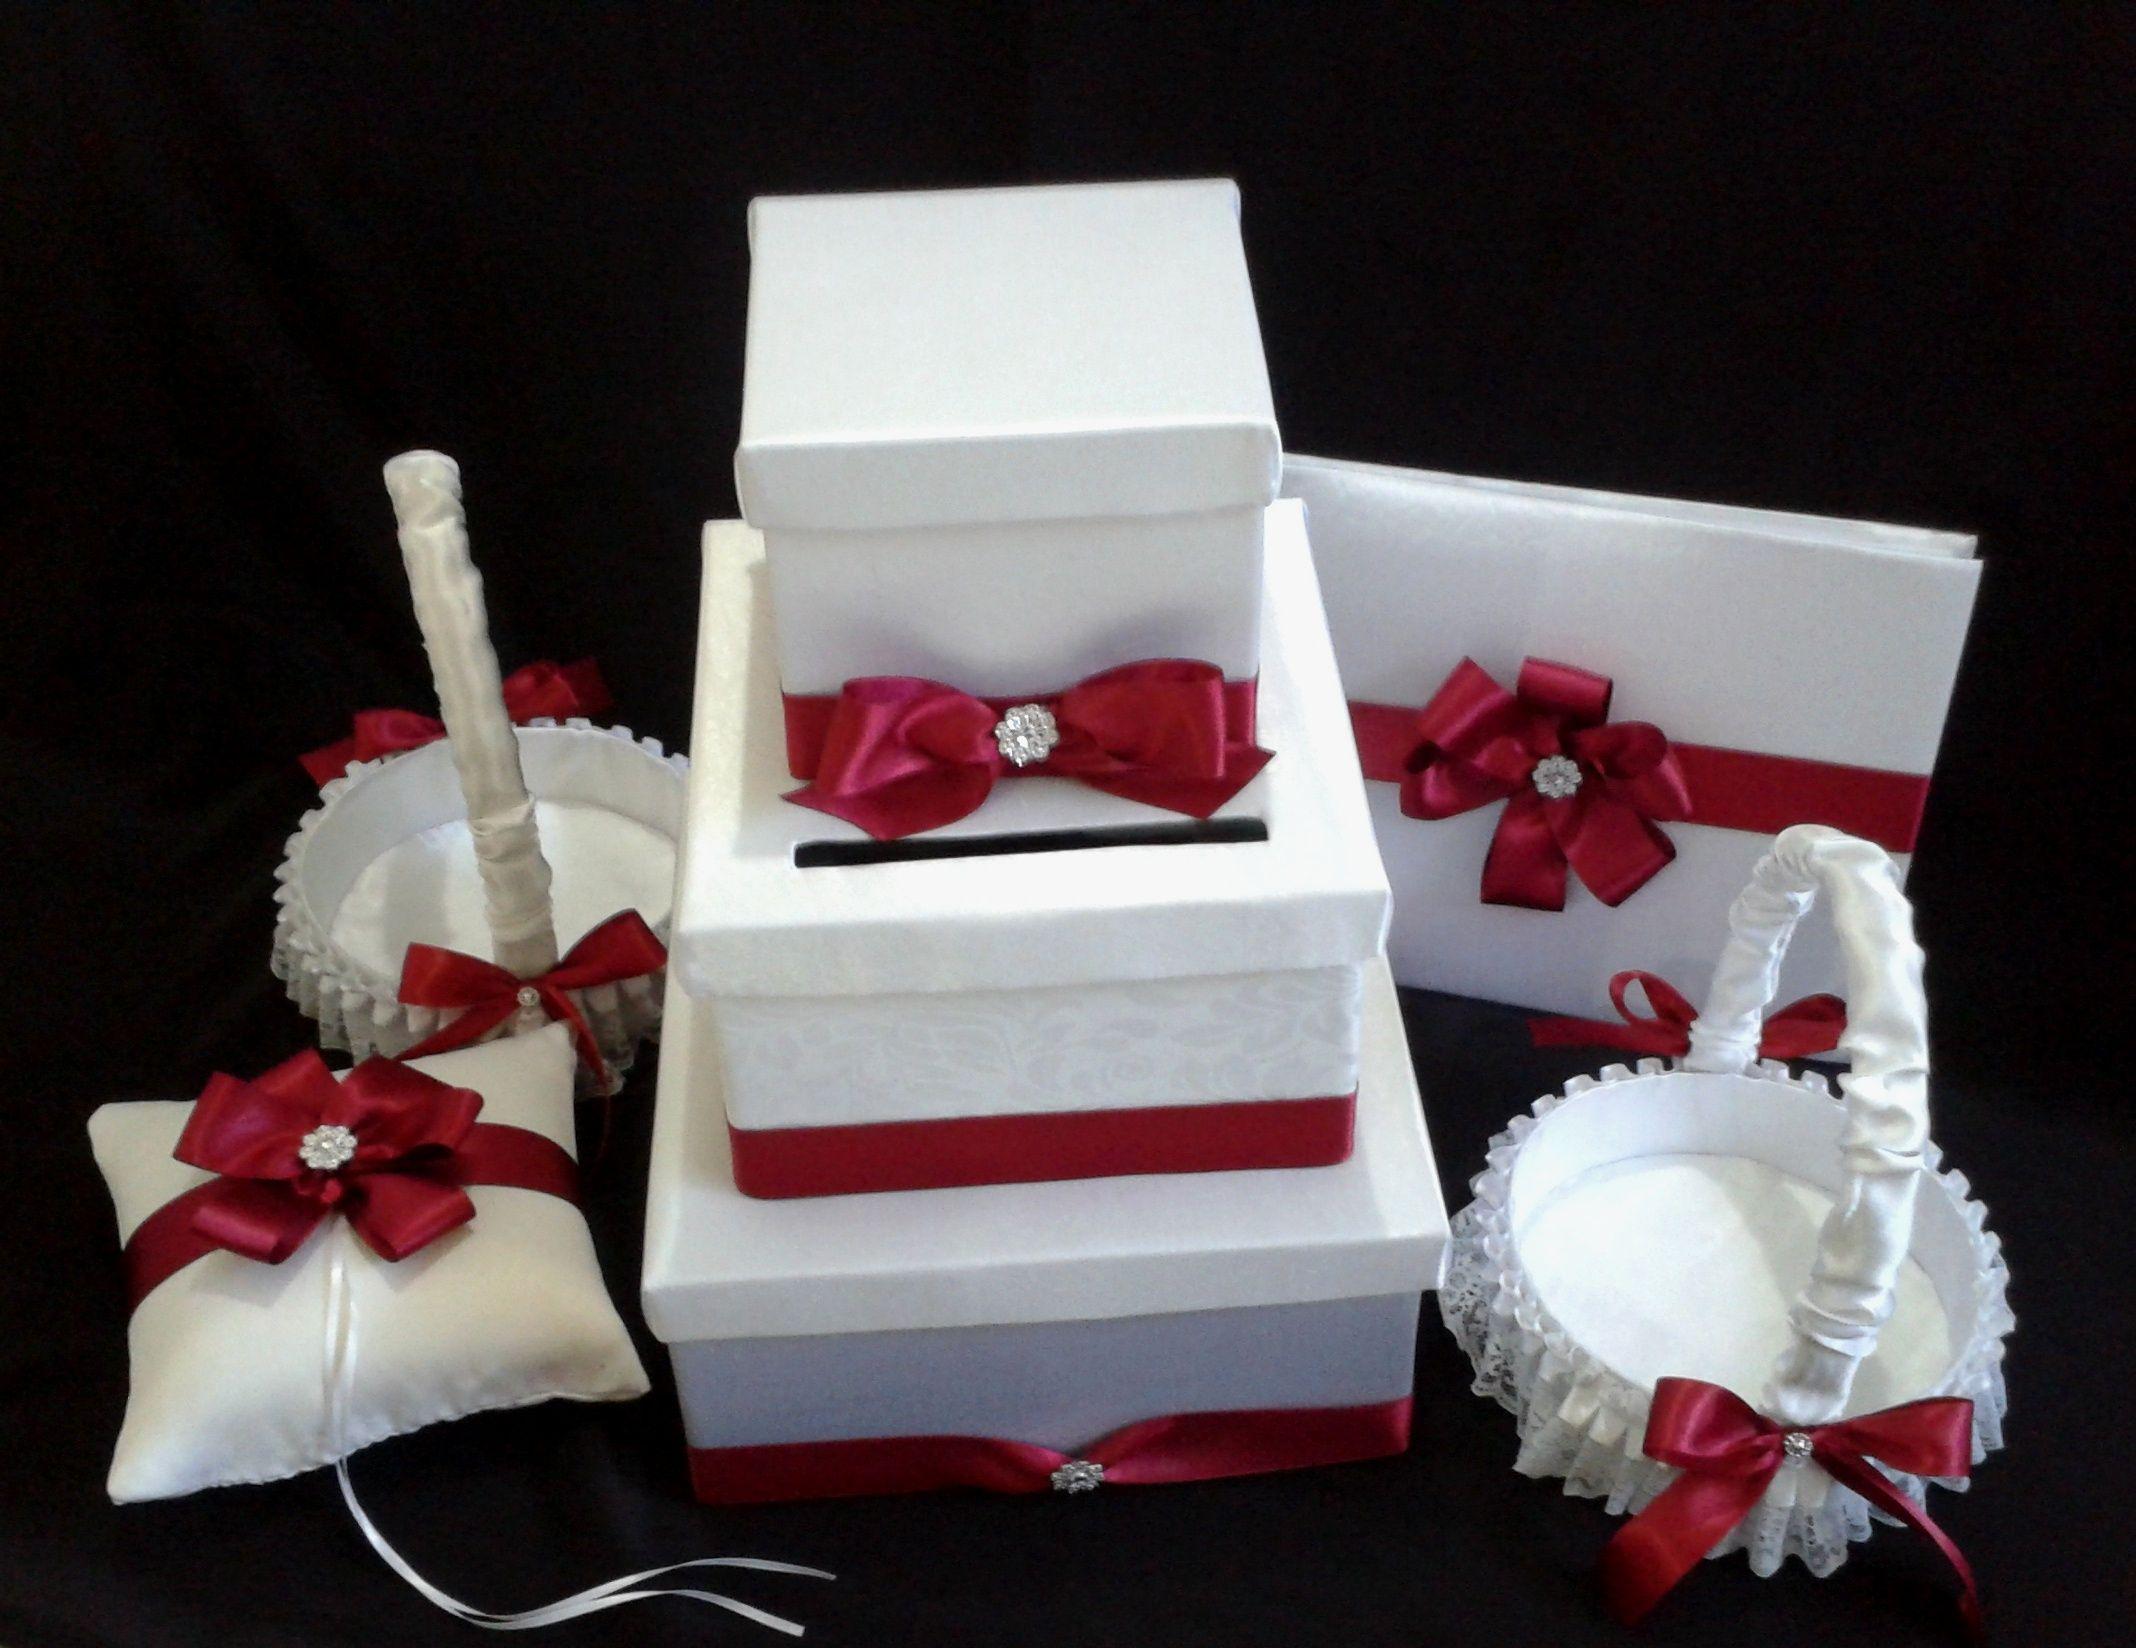 combo caja para sobres libro para firmas cojin y cestas para anillos